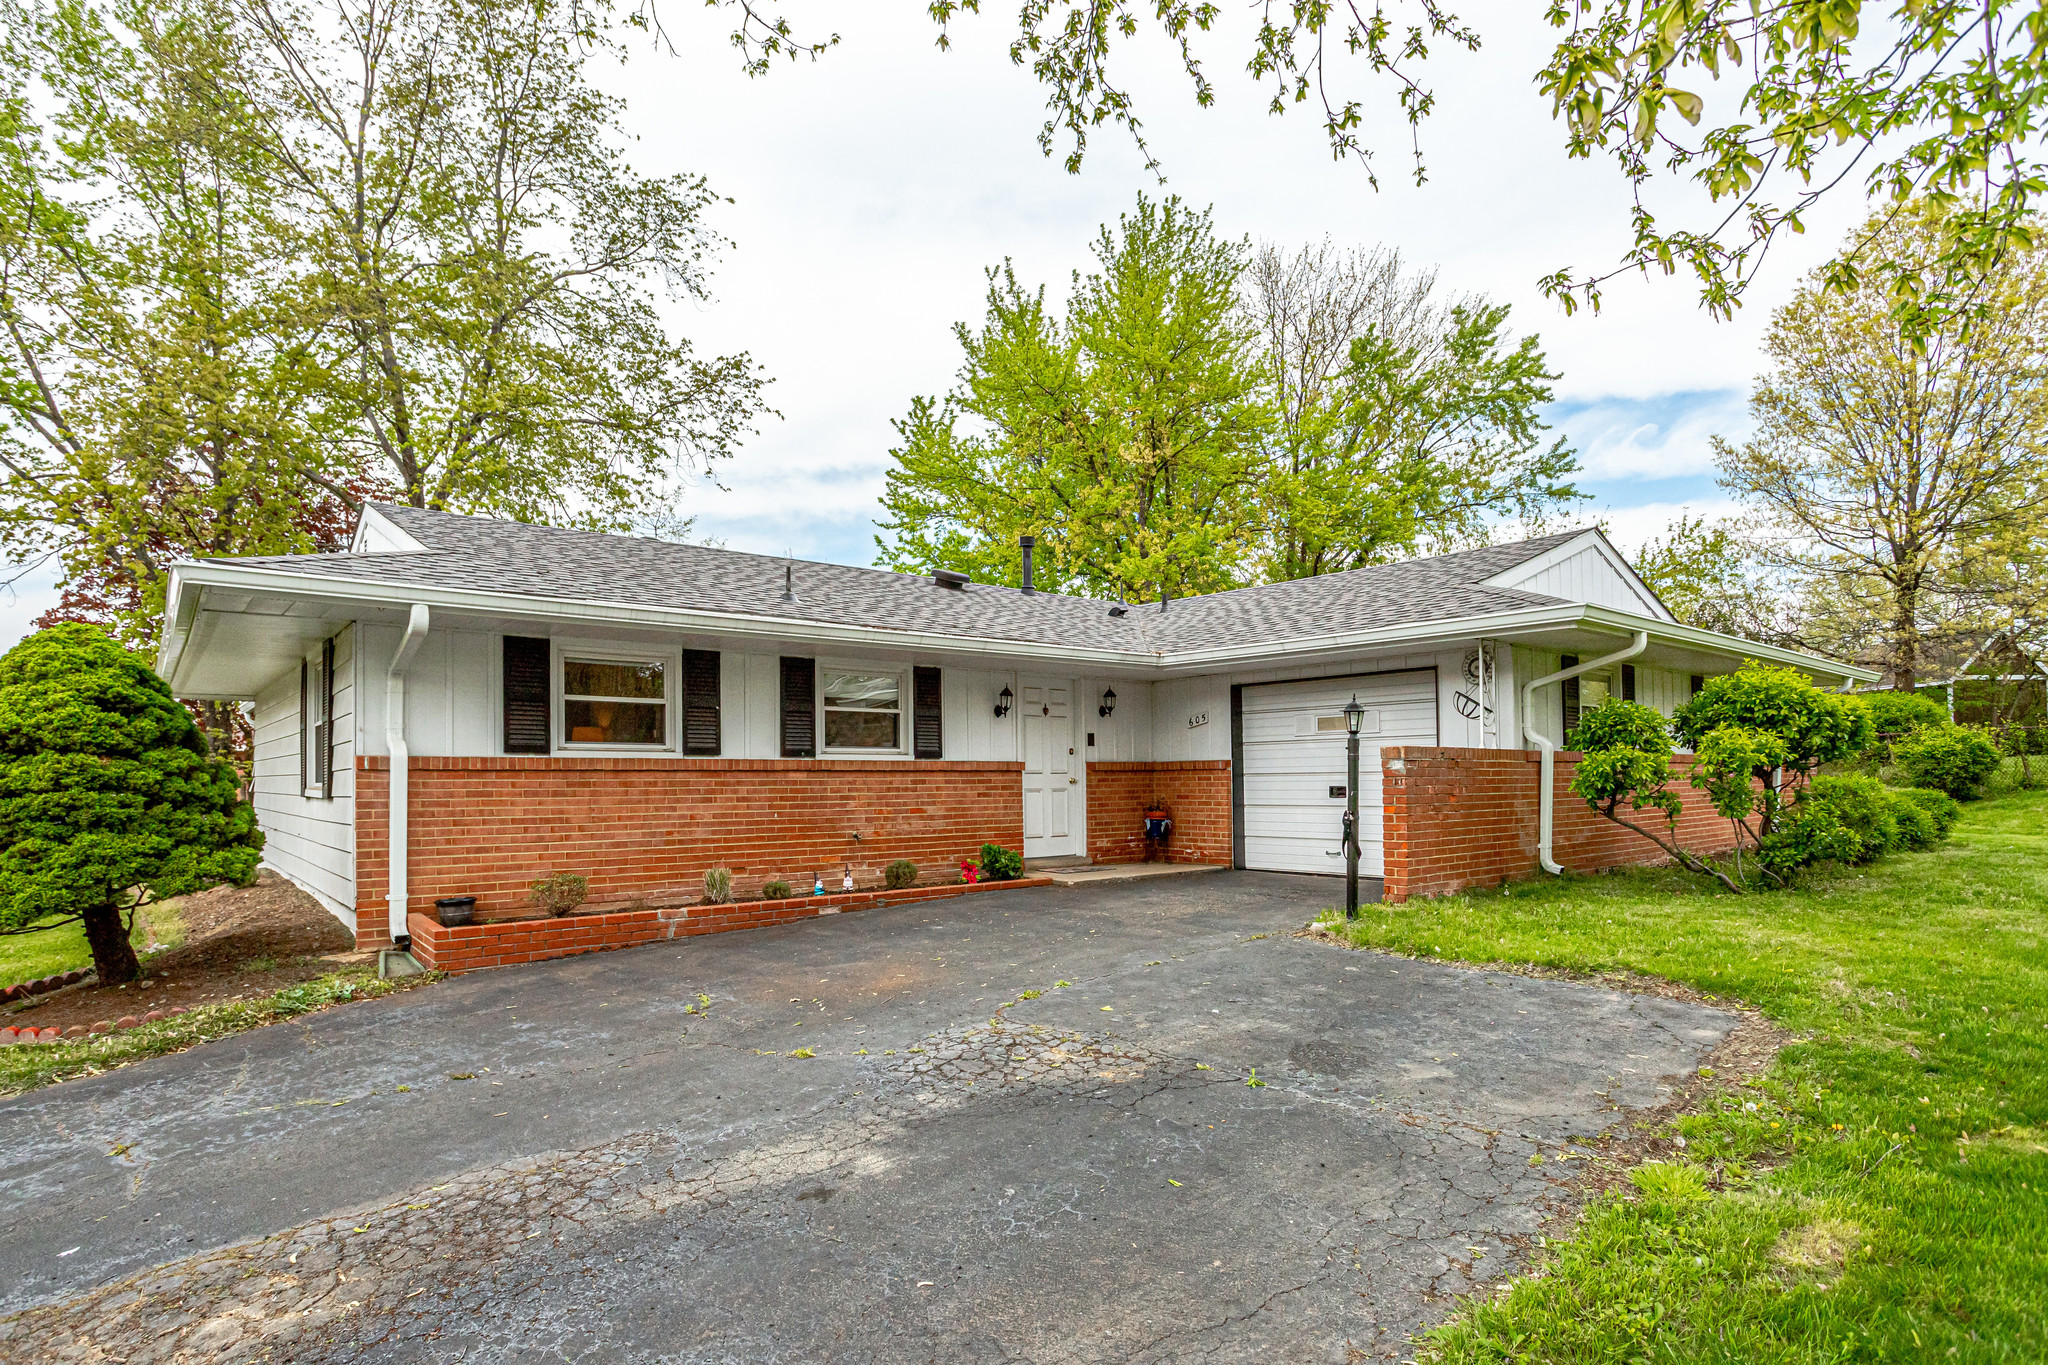 605 E Roanoke Rd, Sterling- For Sale